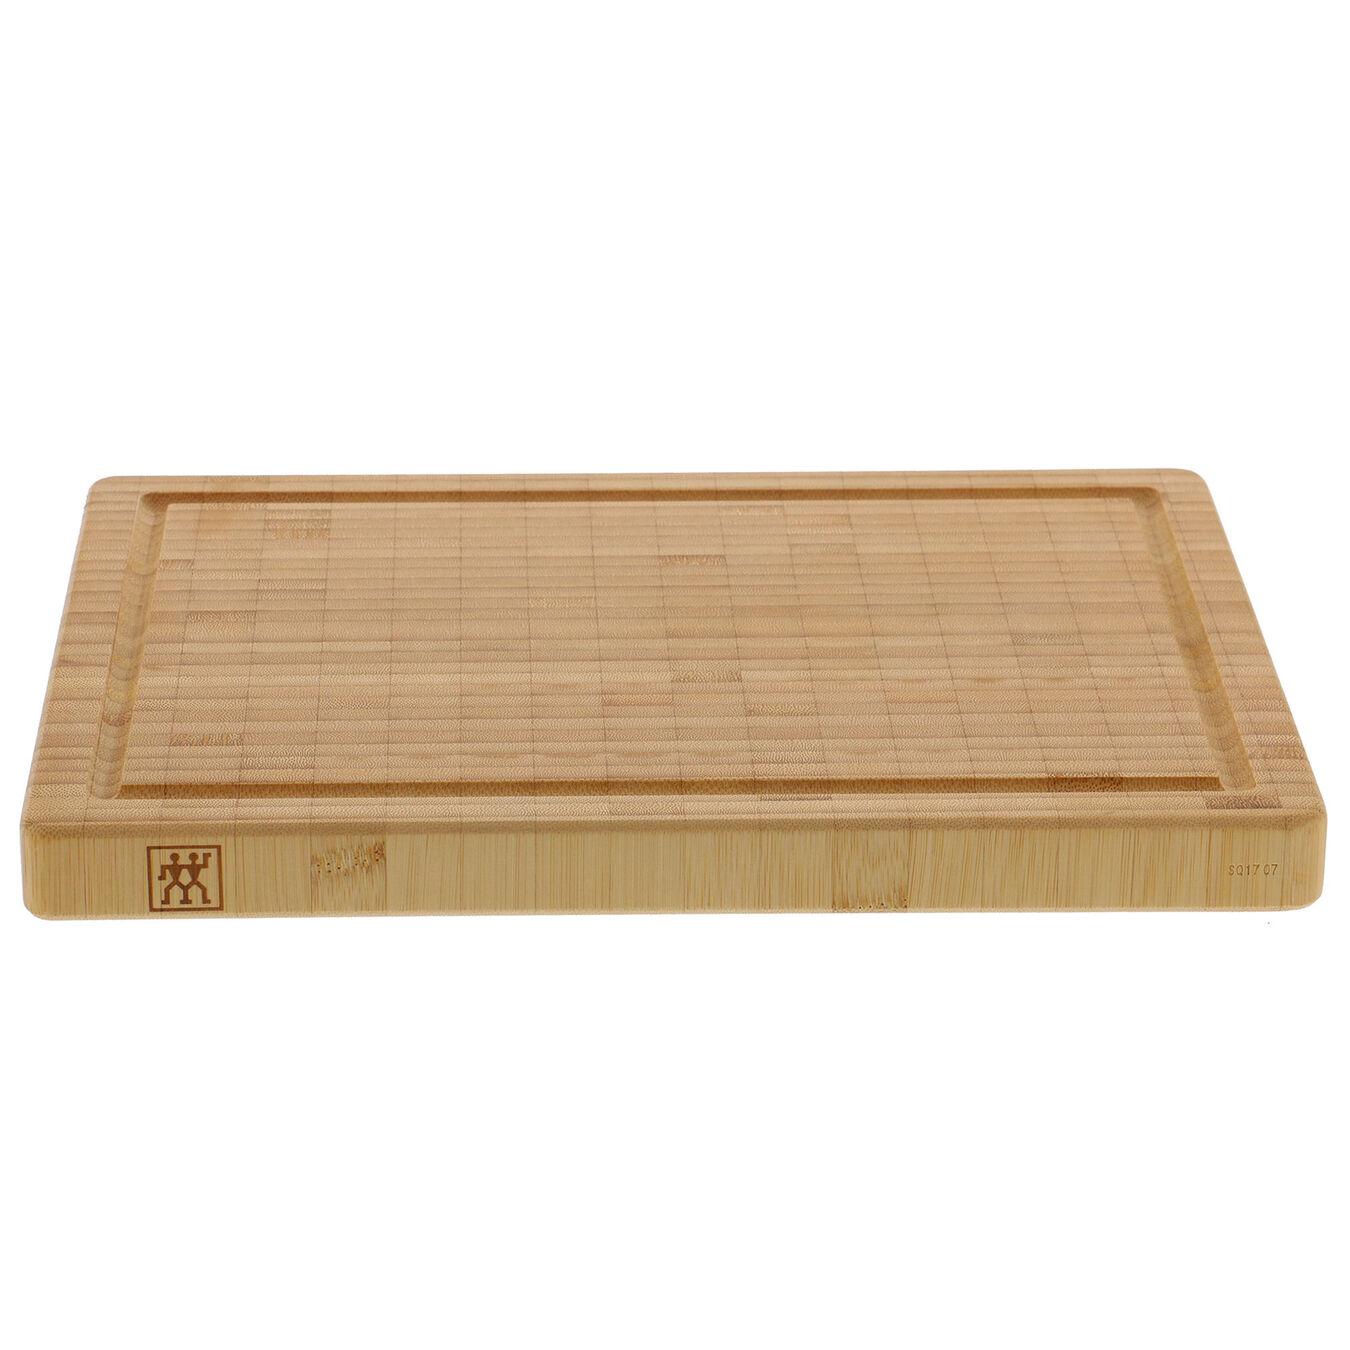 Tagliere - 36 cm x 25 cm, bamb,,large 4